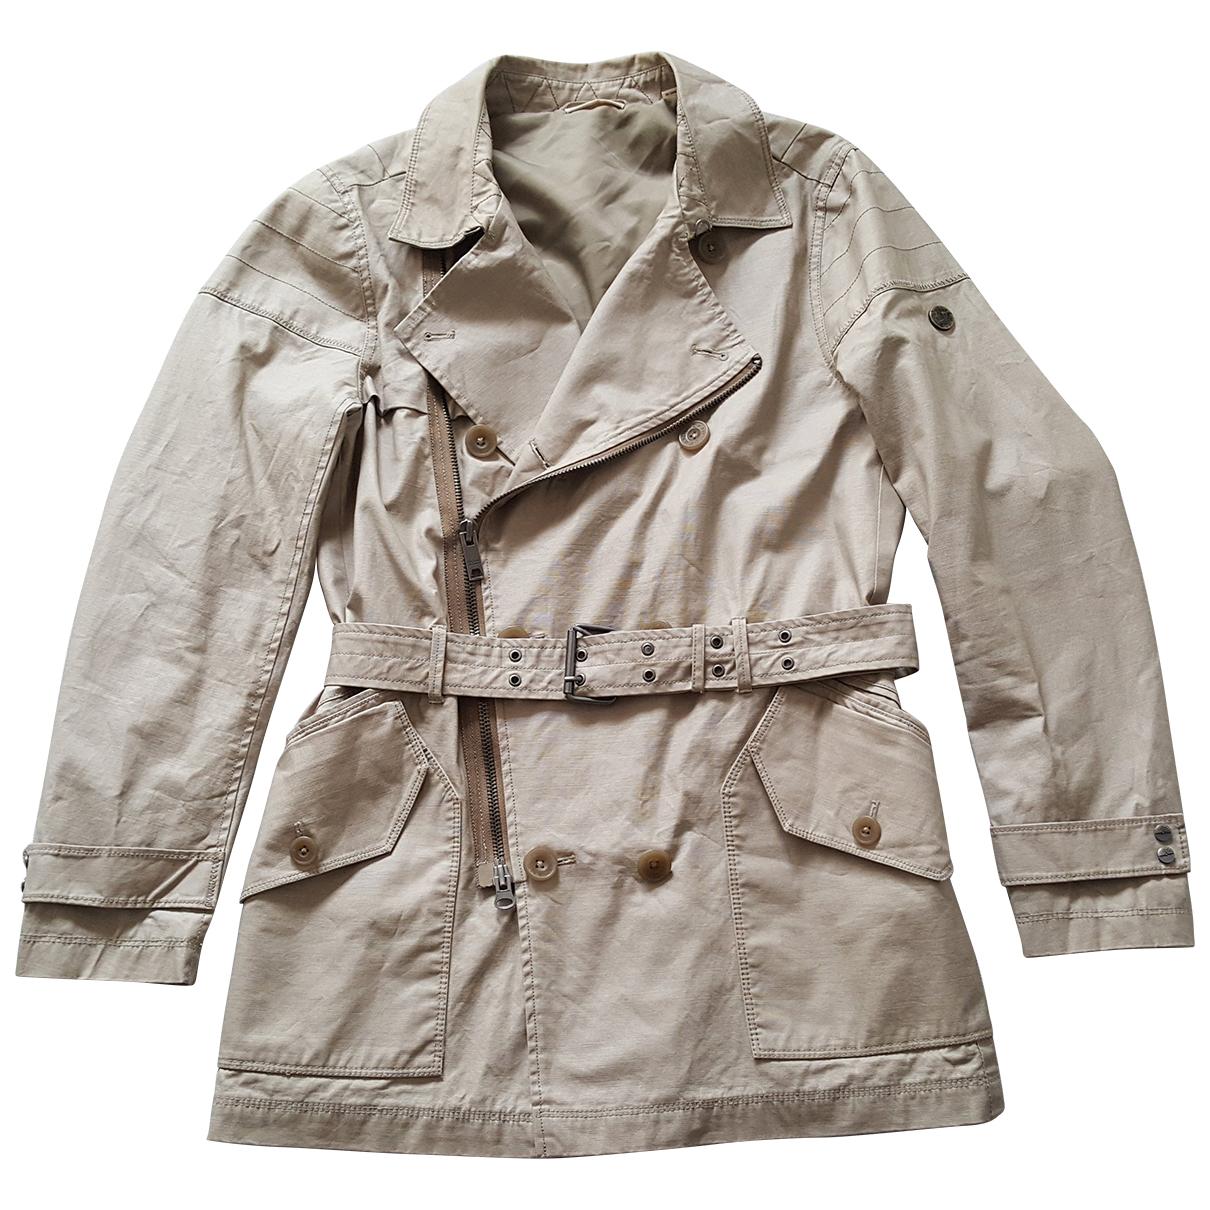 Donna Karan N Beige Cotton coat for Women M International